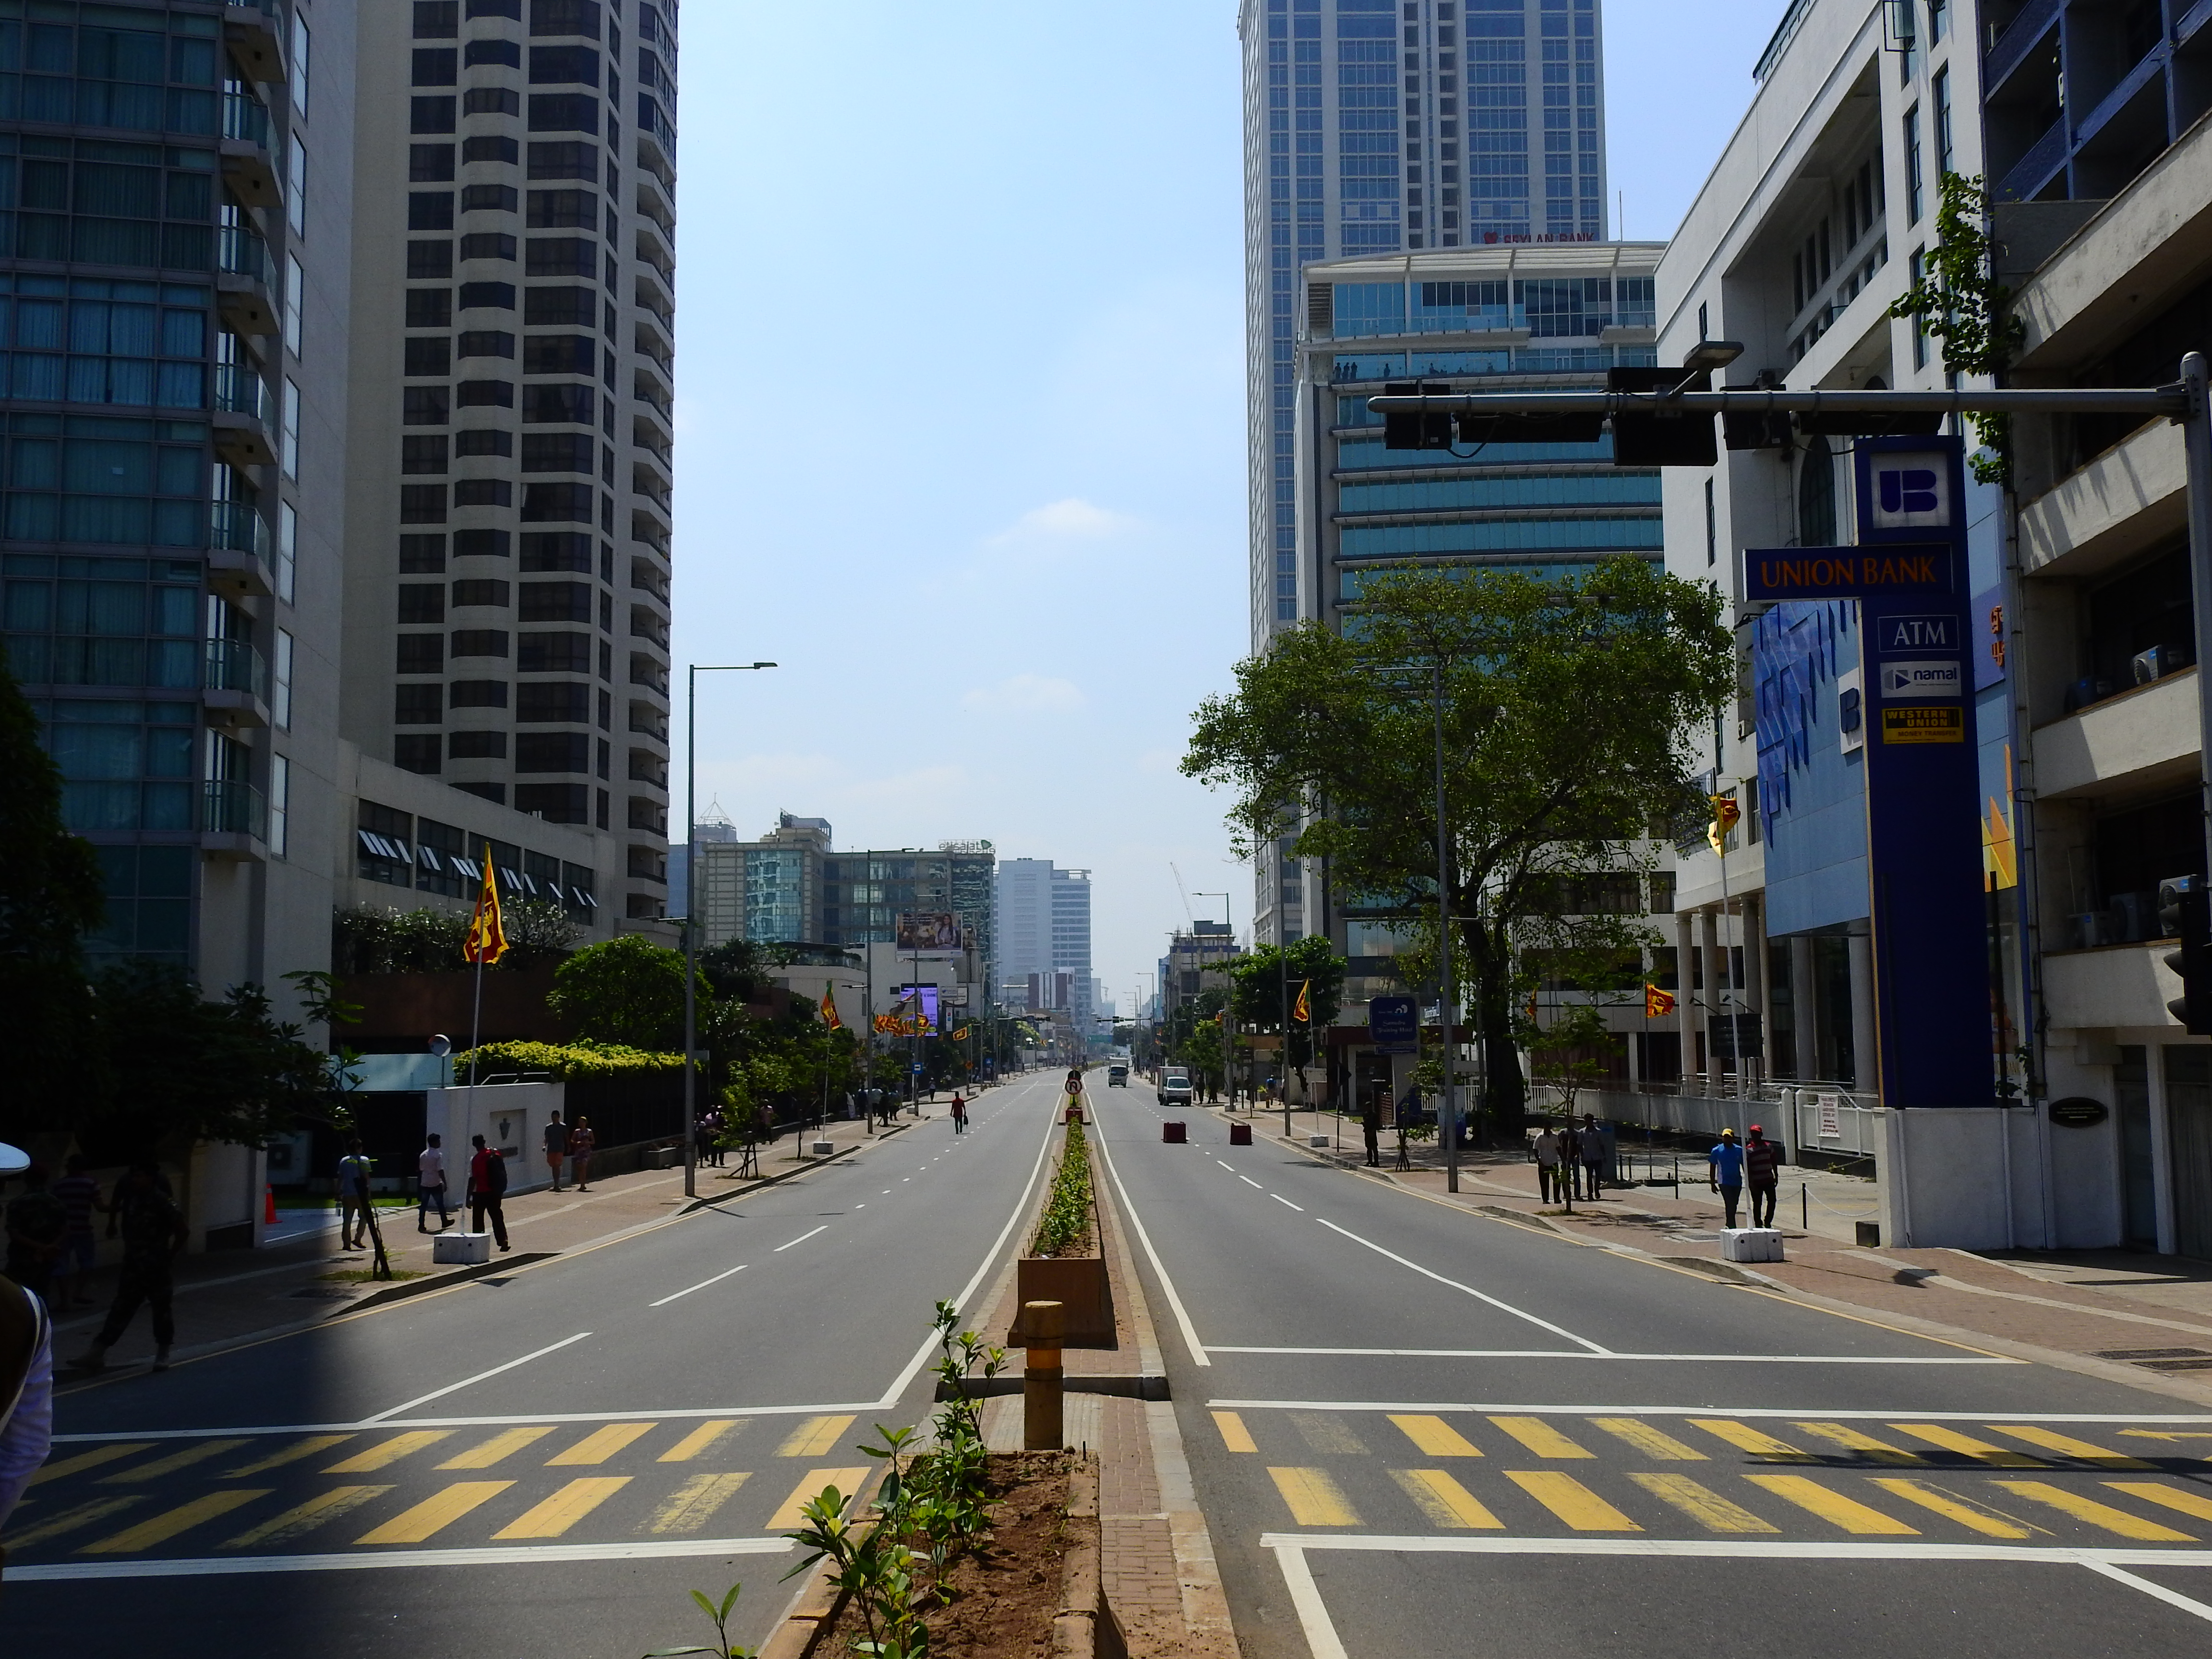 A2 highway (Sri Lanka) - Wikipedia